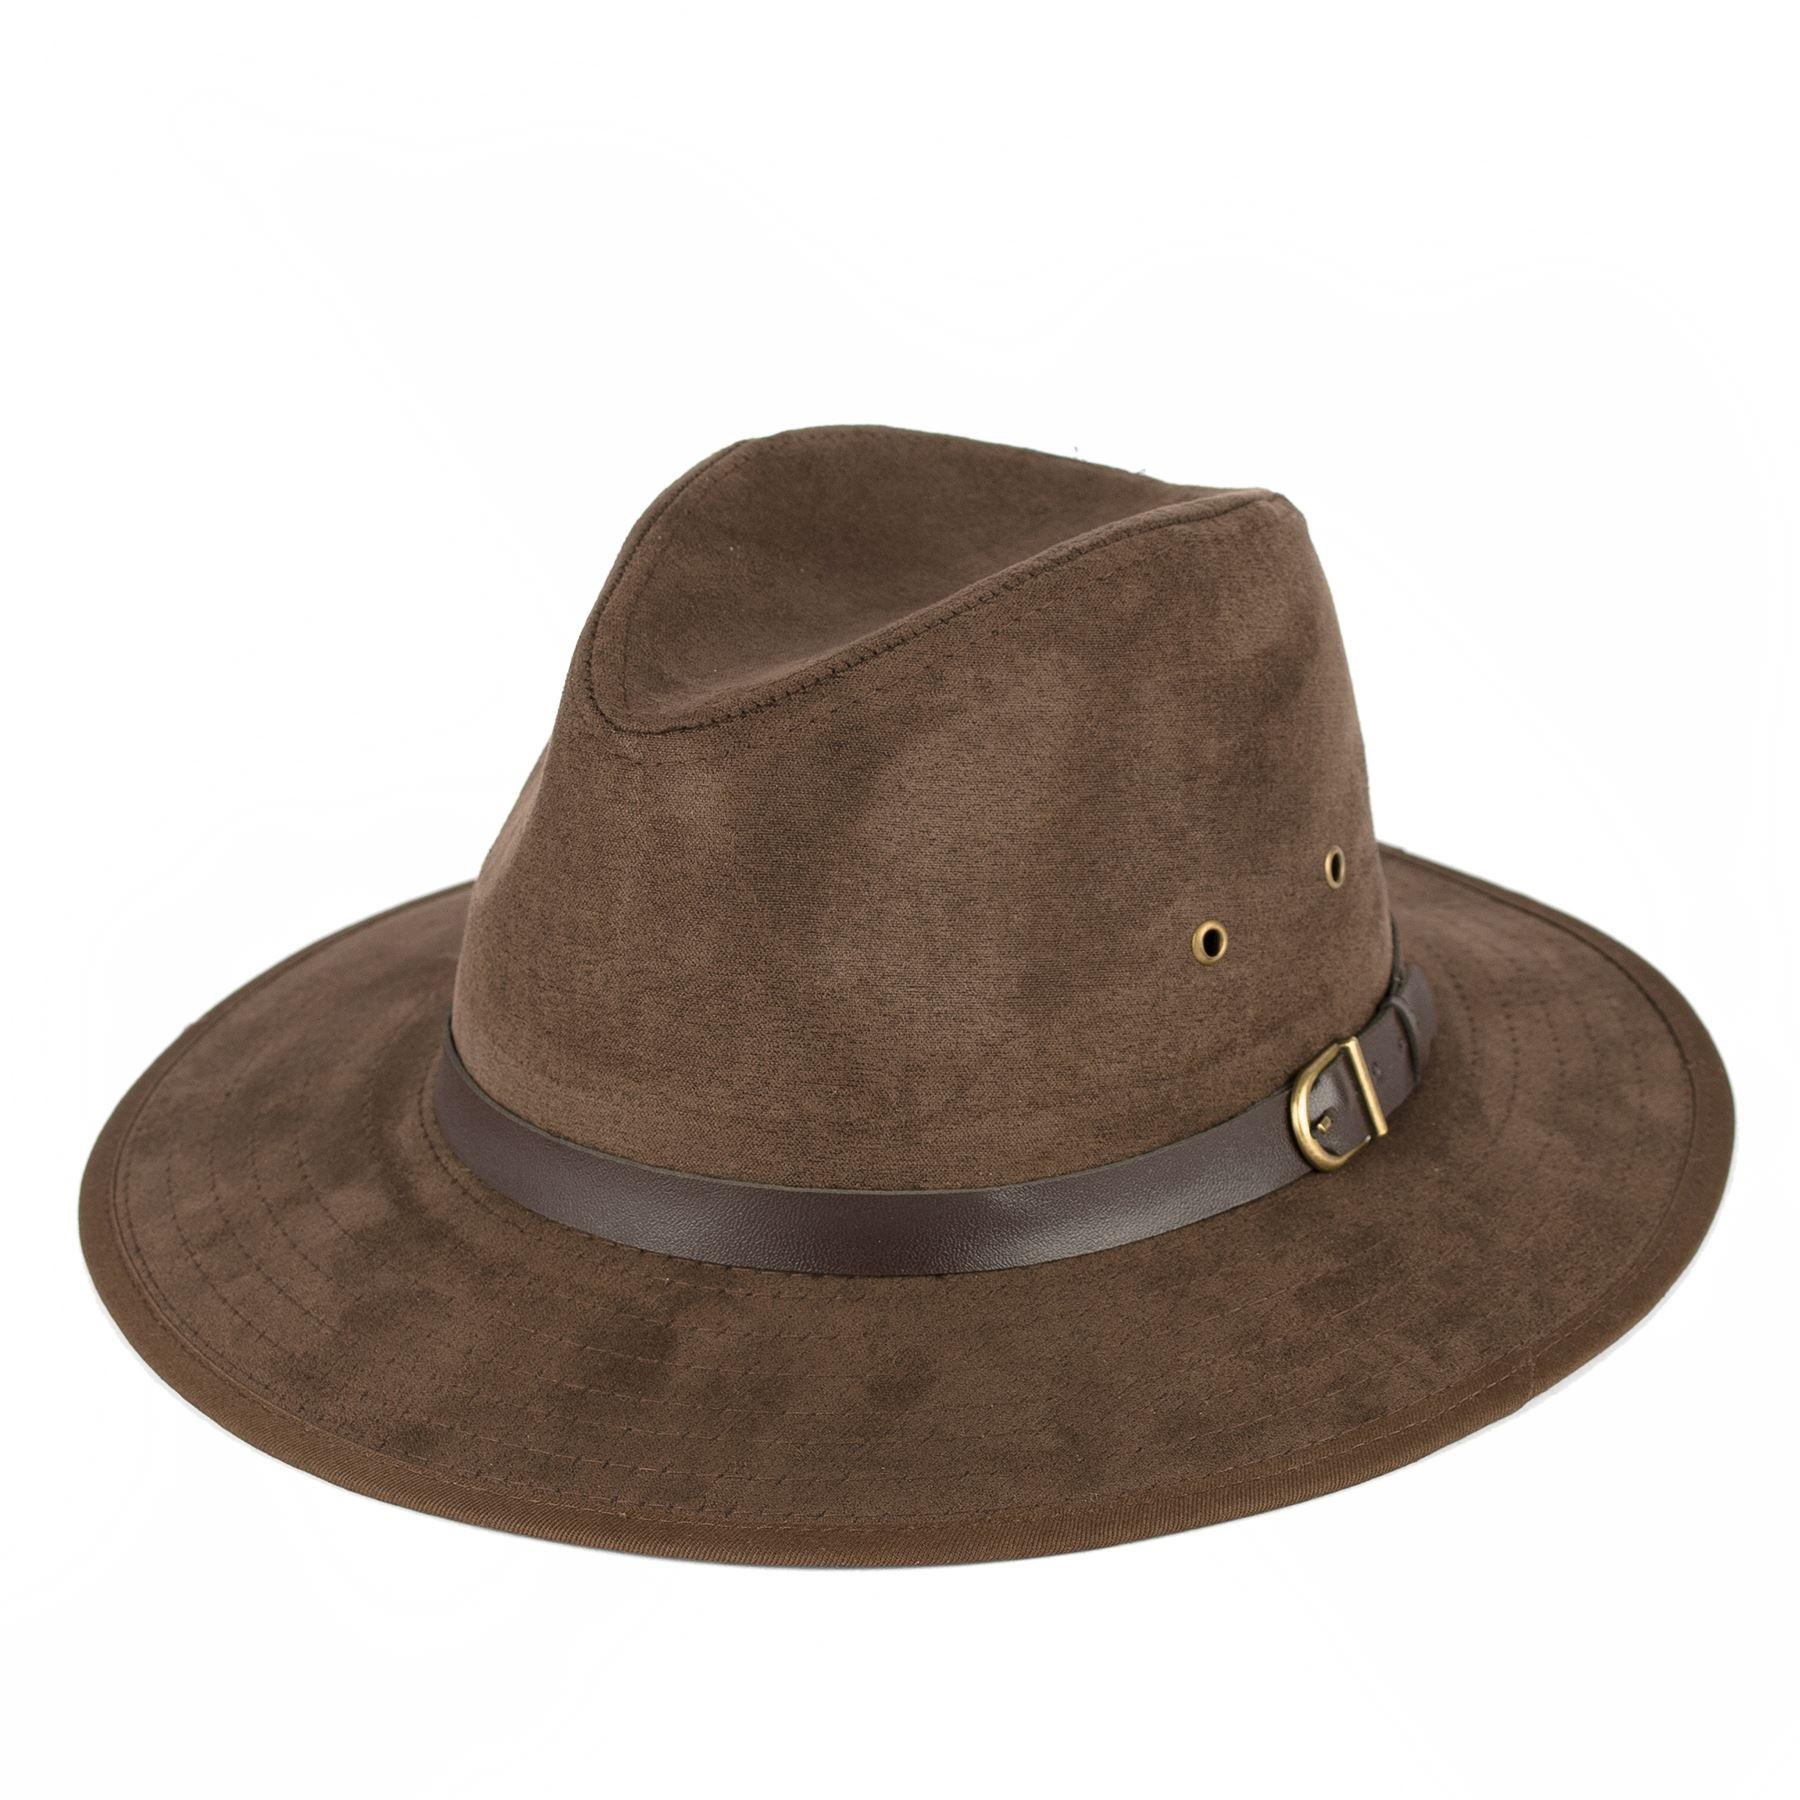 hommes femmes chapeau fedora casquette ebay. Black Bedroom Furniture Sets. Home Design Ideas